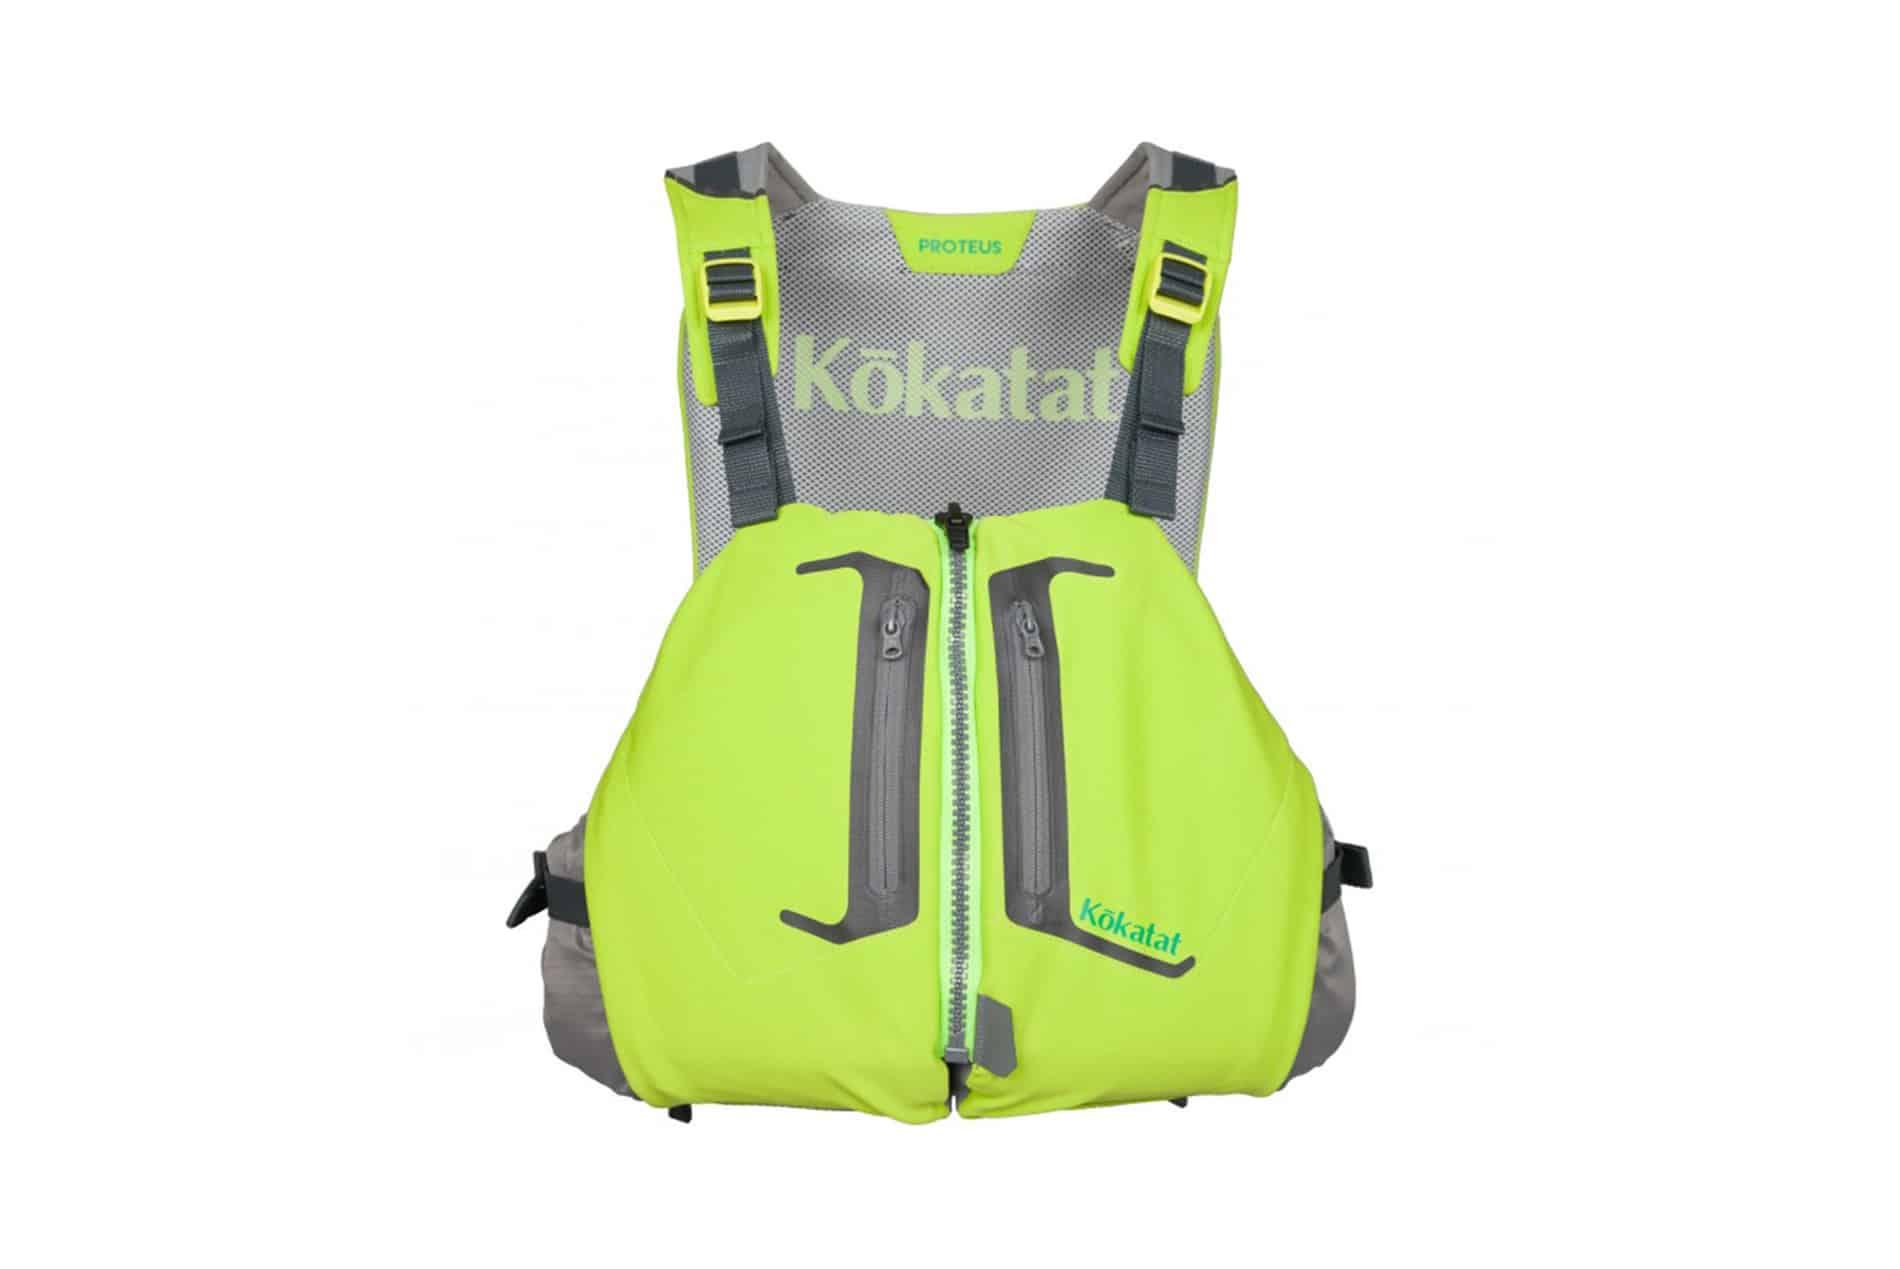 Kokatat Proteus Life Jacket